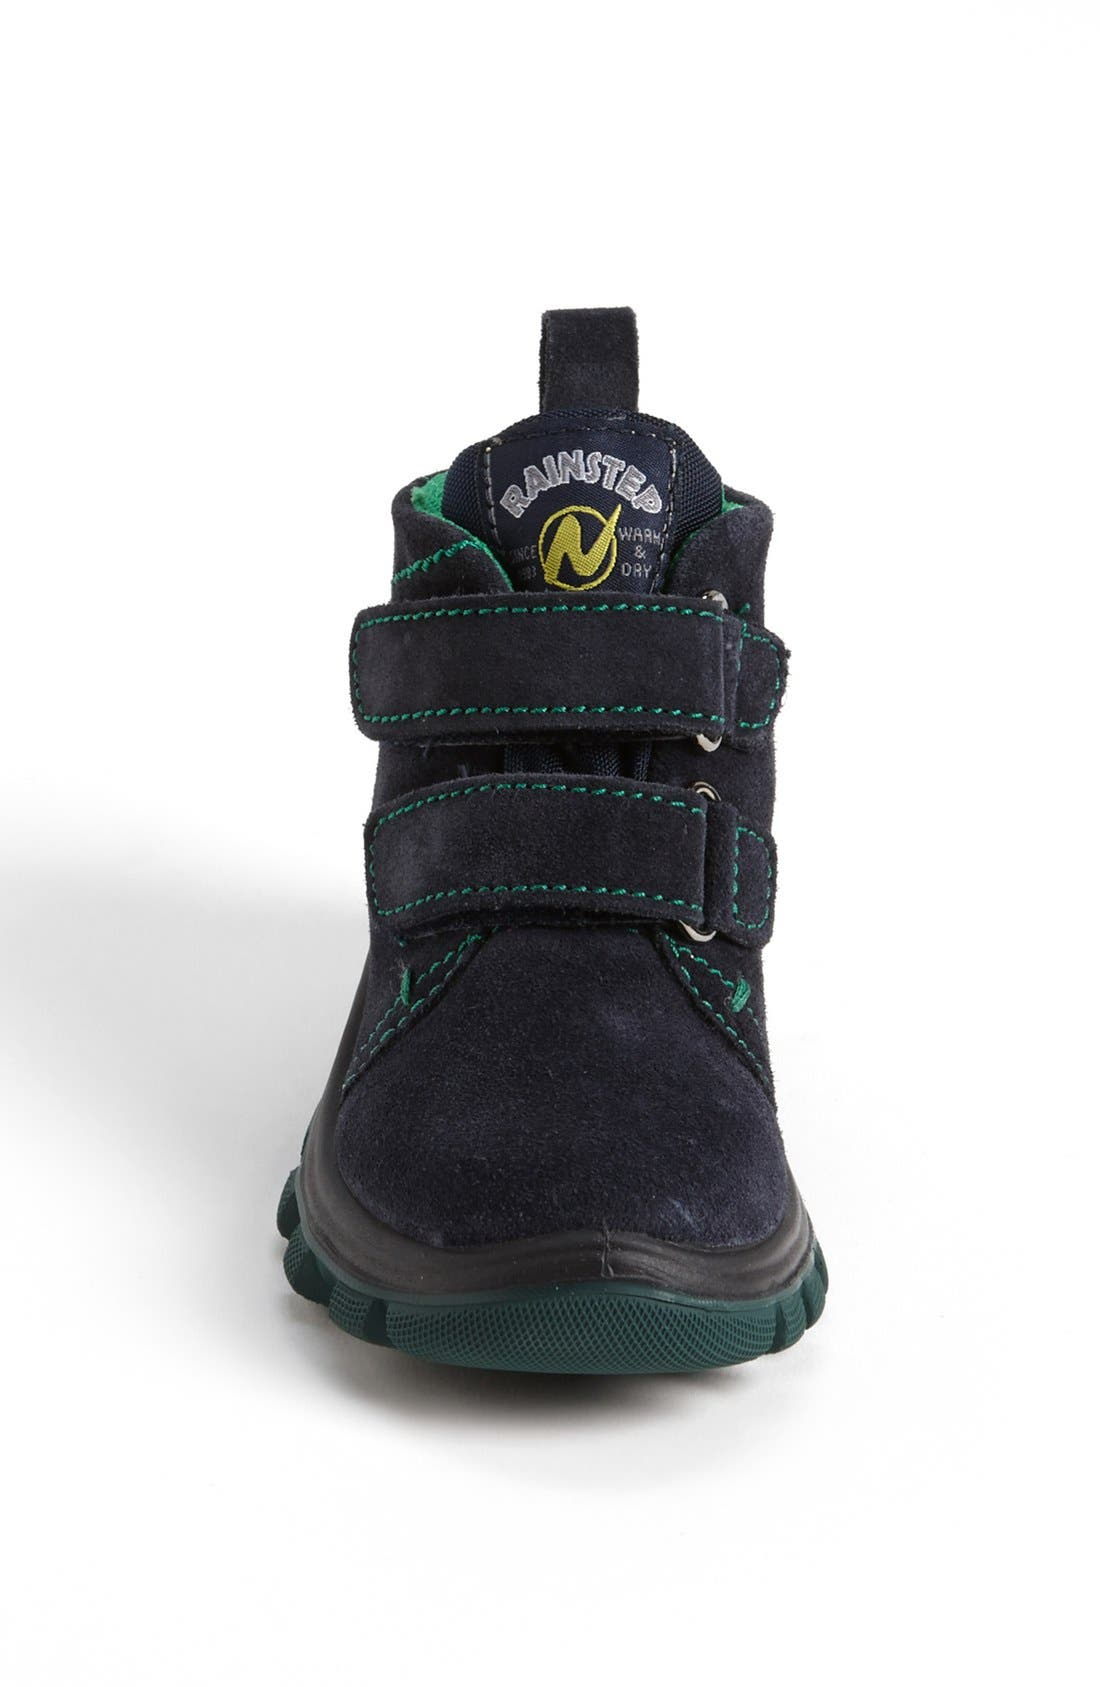 Alternate Image 3  - Naturino 'Bakutis Rainstep' Waterproof Boot (Walker, Toddler & Little Kid)